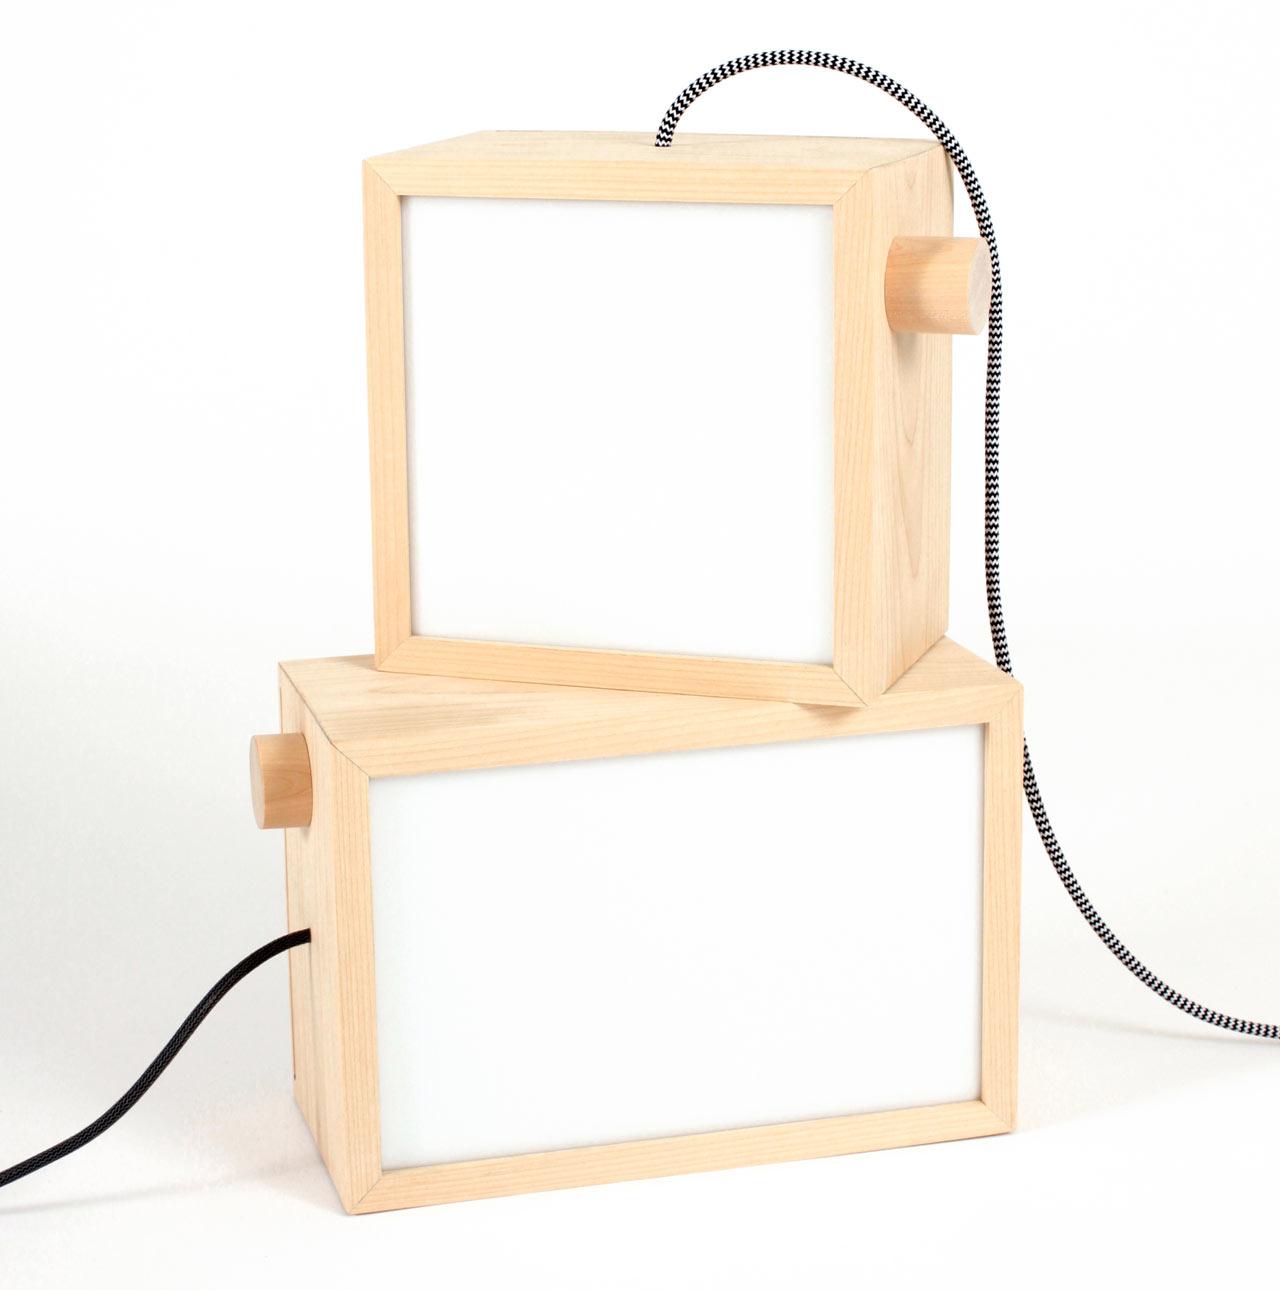 LM Magnetic Light Box by Domaas/Høgh